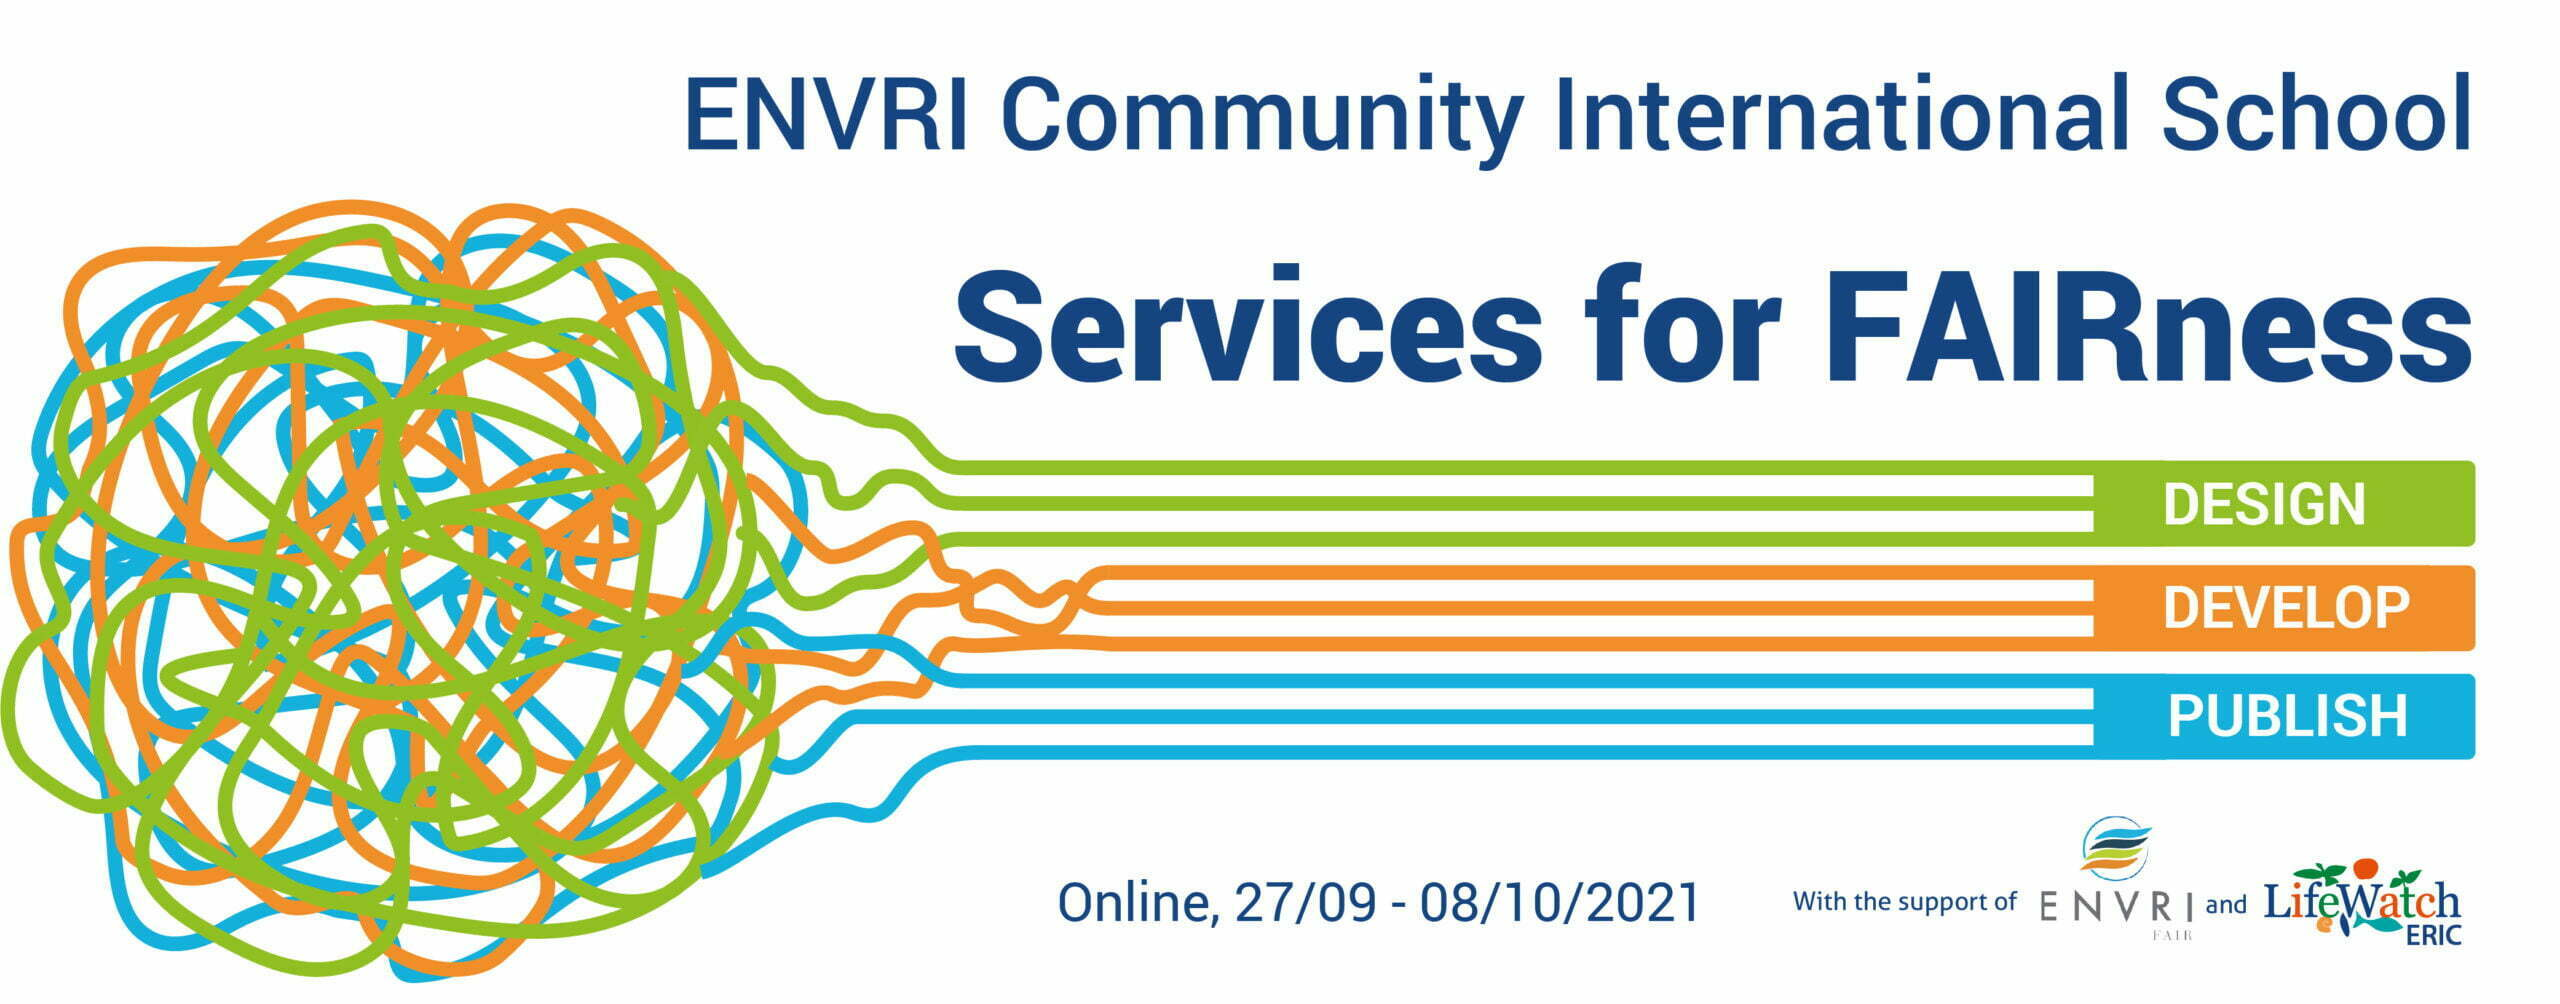 ENVRI Community International School Services for FAIRness